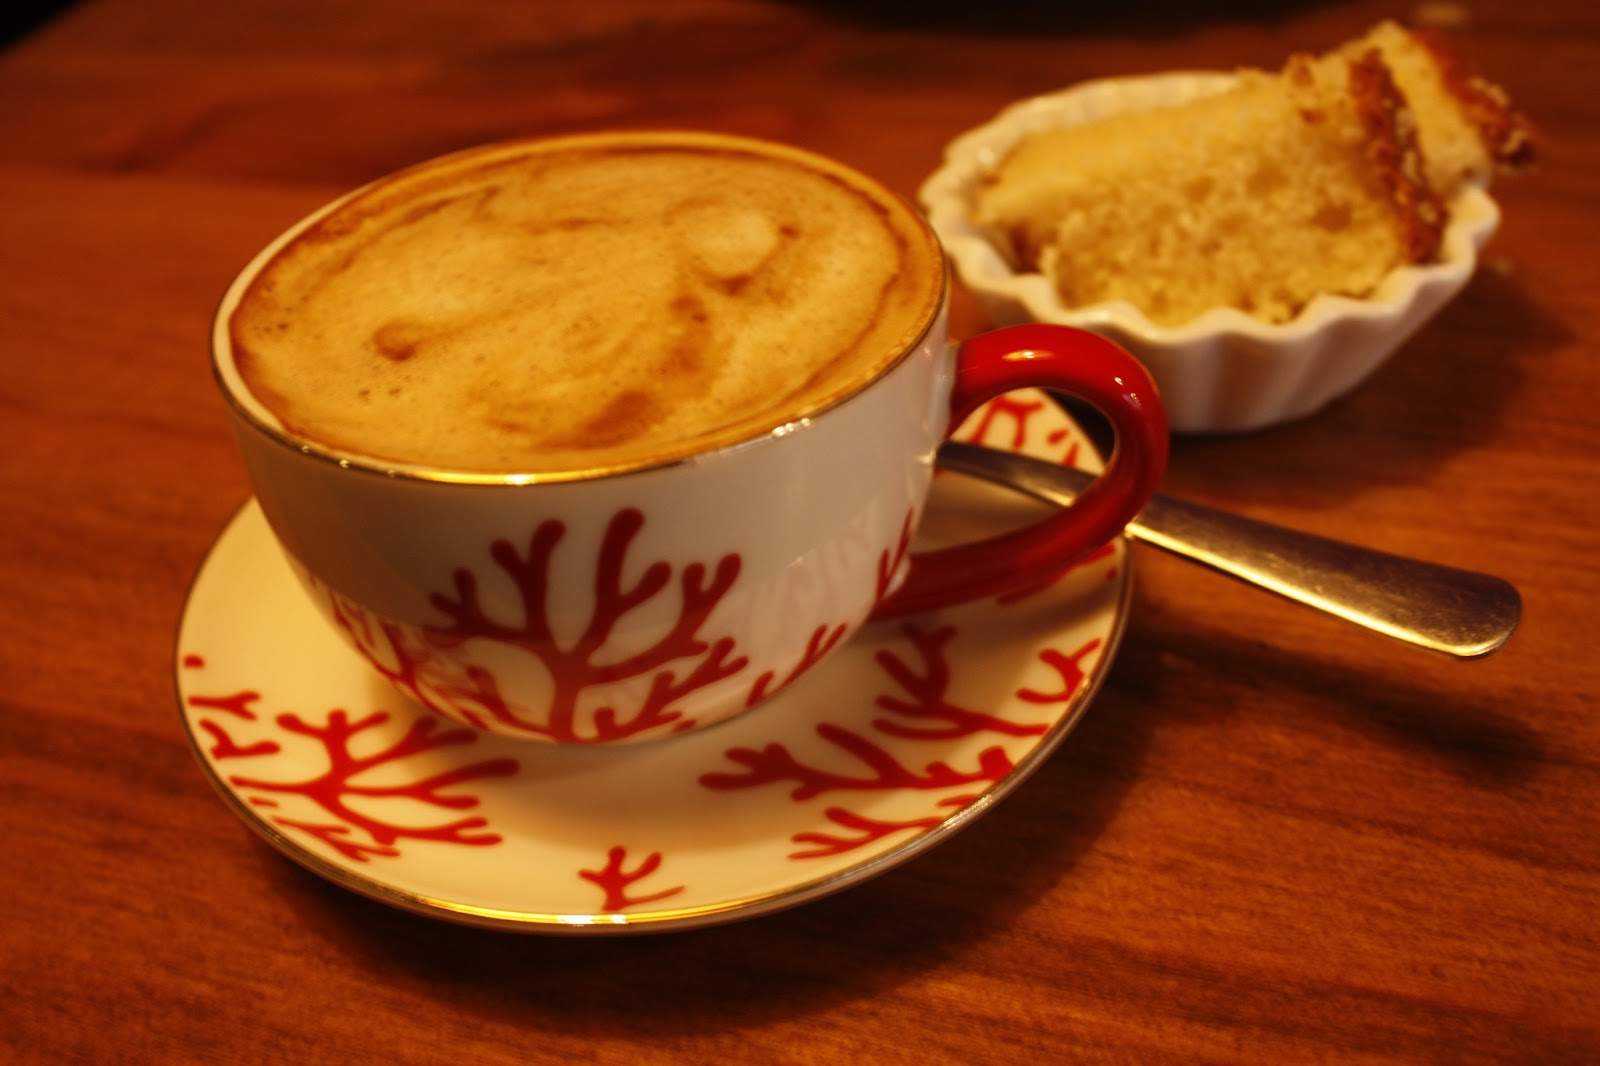 Photo essay asturias by mouth sobremesa in spain for Asturias cuisine